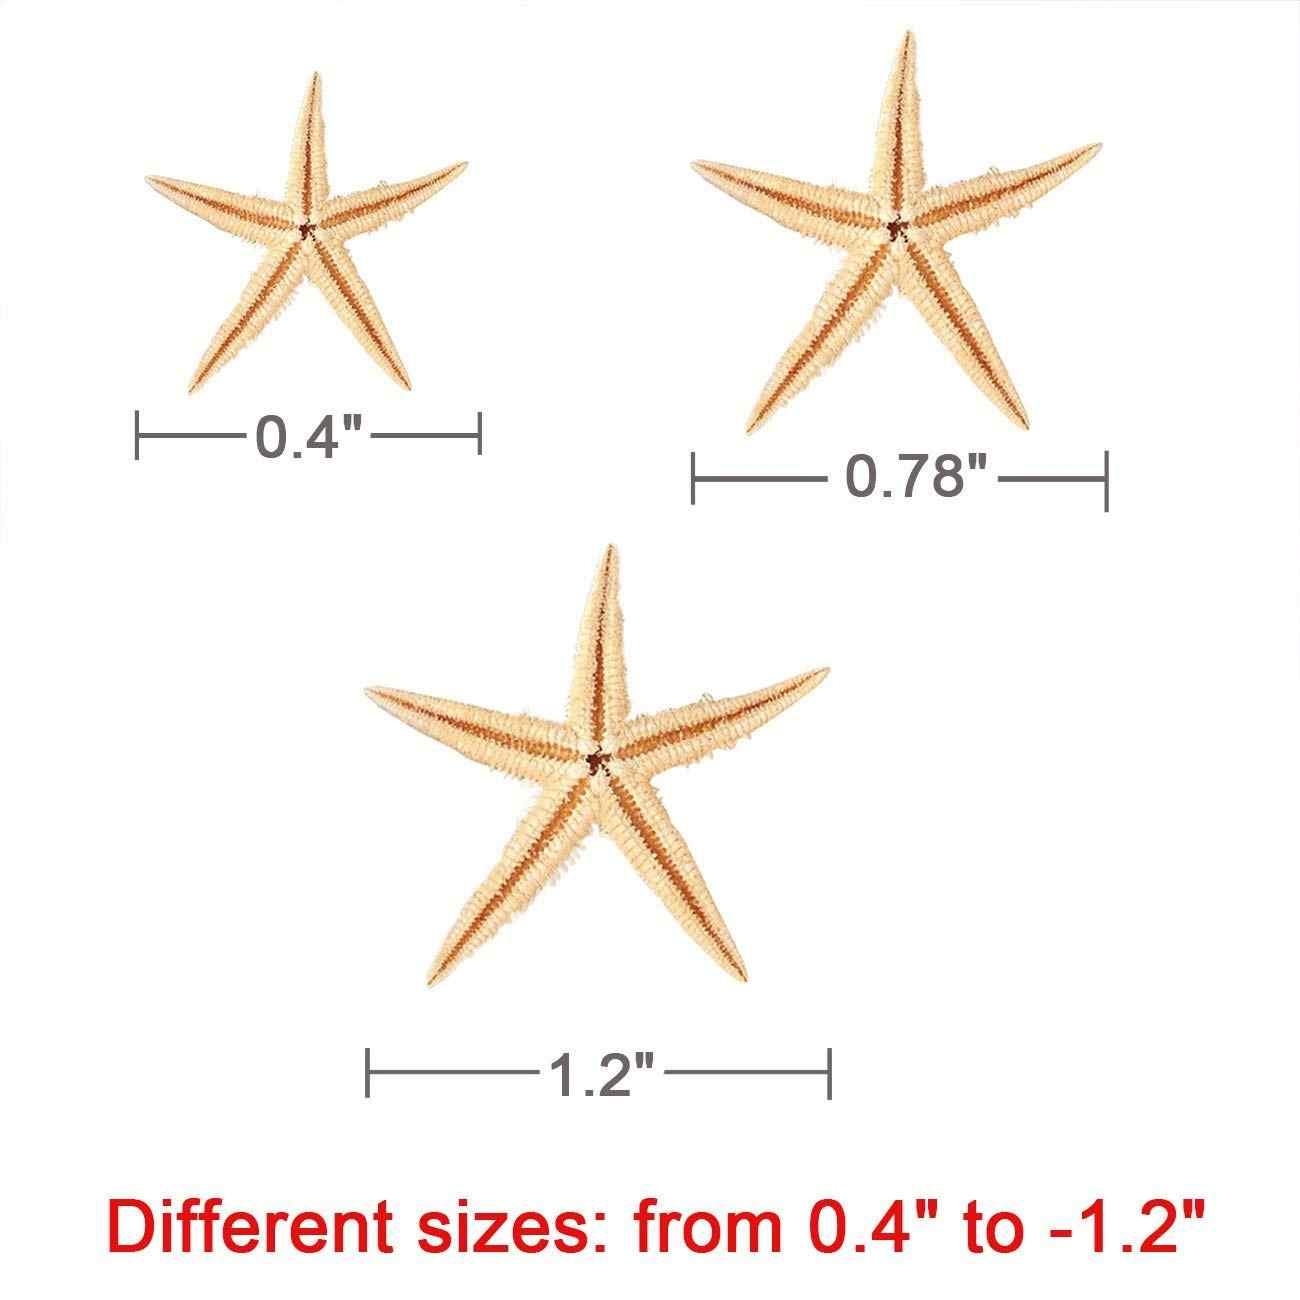 קטן כוכב ים כוכב ים פגז חוף קרפט 0.4 אינץ-1.2 אינץ 90 Pcs